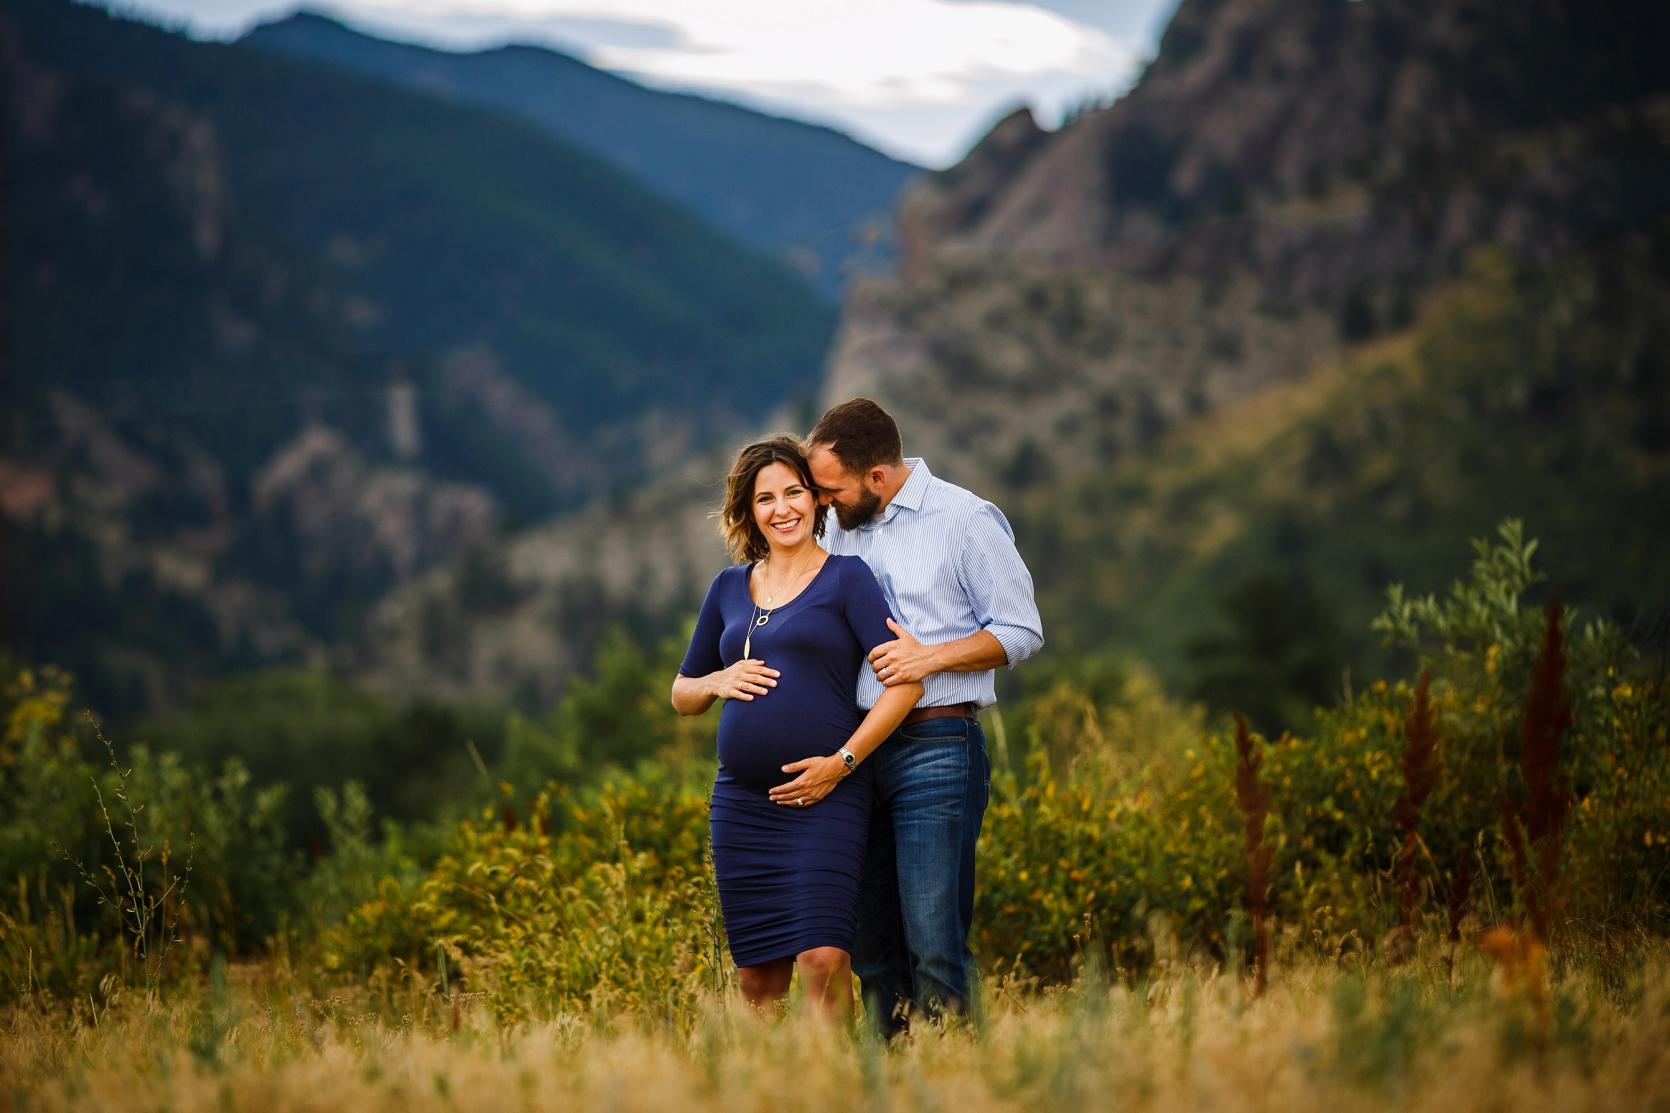 South_Mesa_Trailhead_Maternity_Session_0001